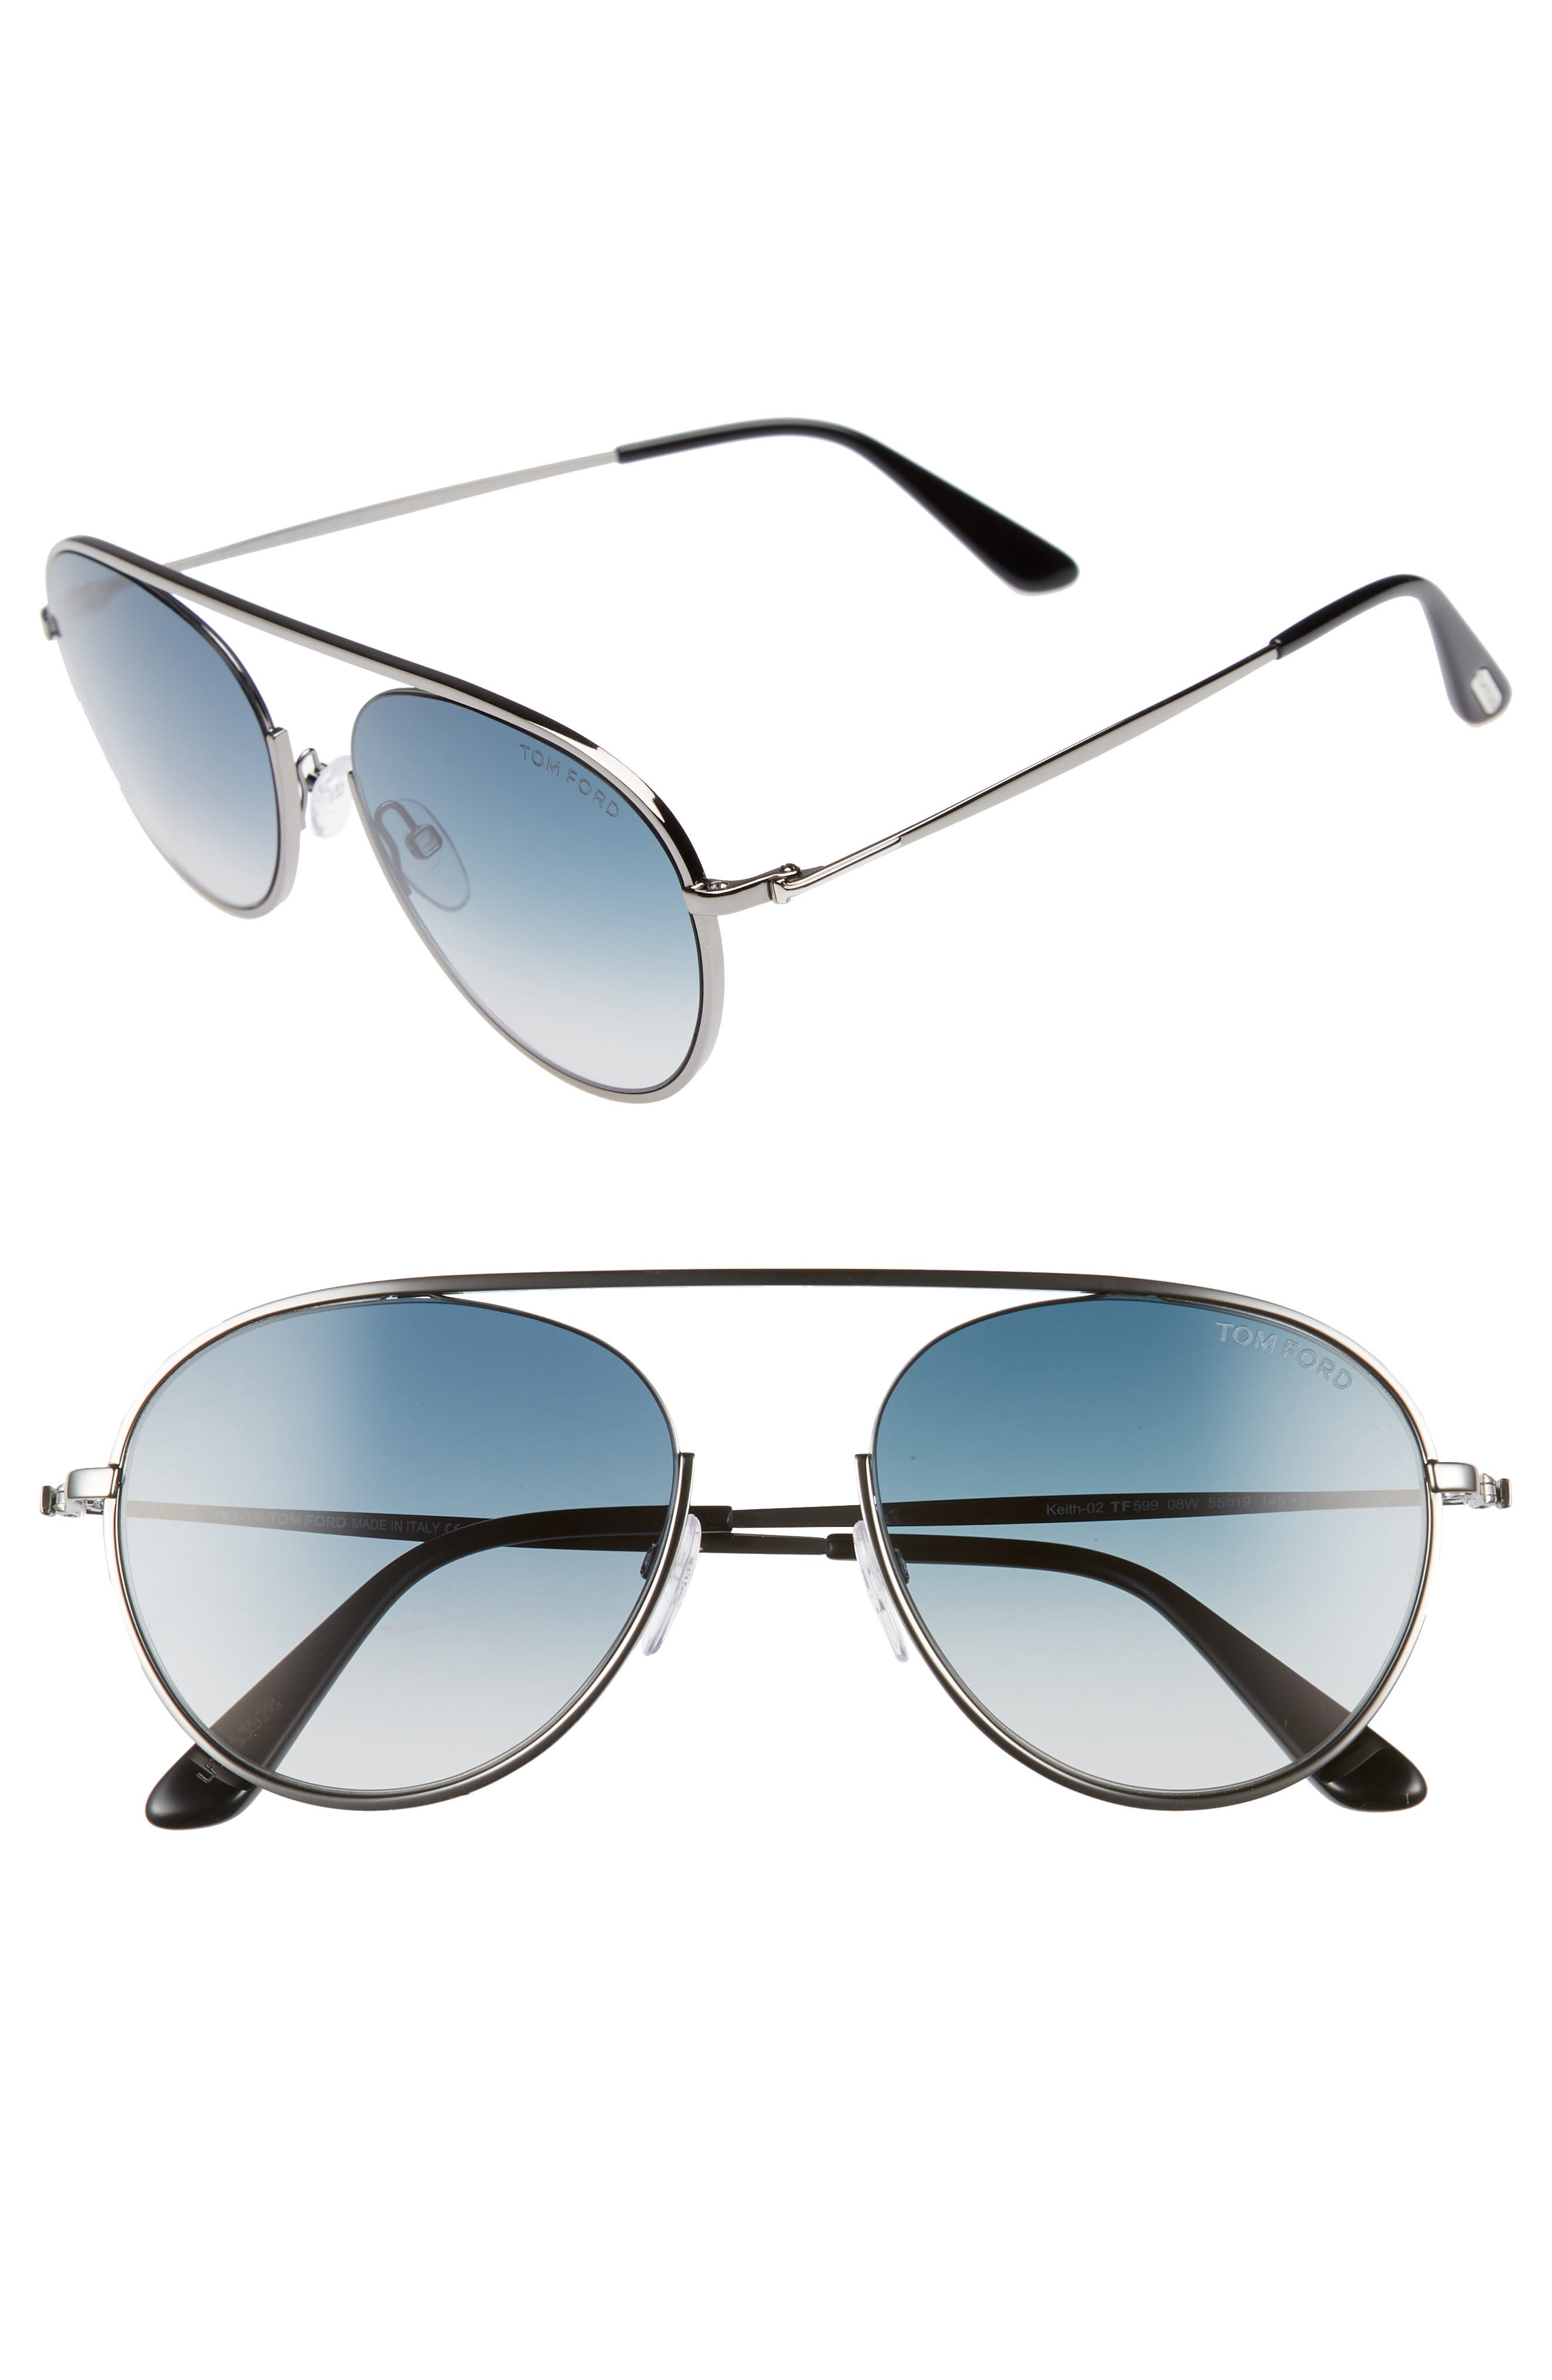 Keith 55mm Metal Aviator Sunglasses,                             Main thumbnail 1, color,                             Shiny Gumetal/ Gradient Blue